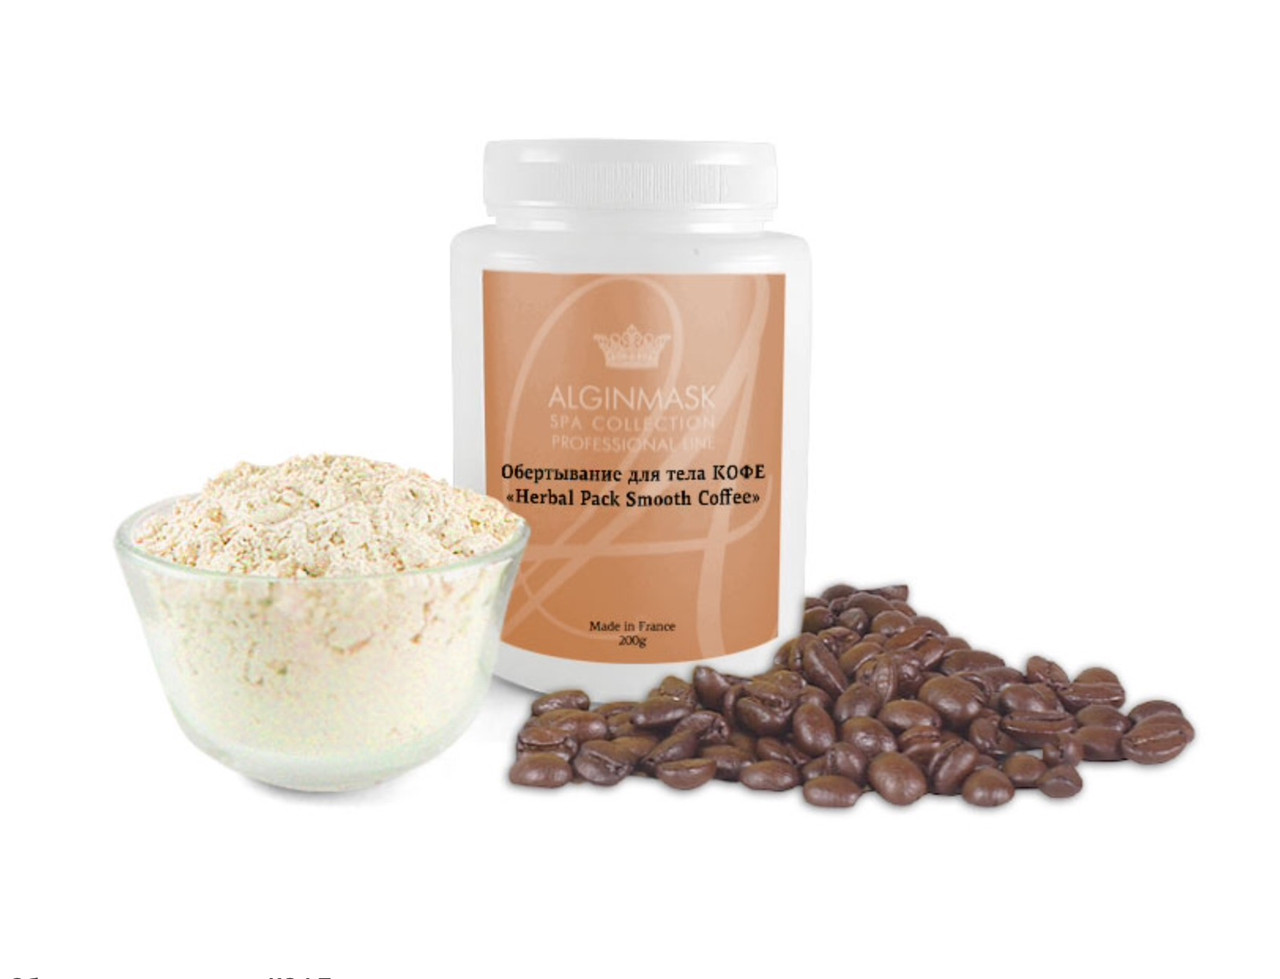 "Обертывание для тела Кофе - ""Herbal Pack Smooth Coffee"", 250 г"